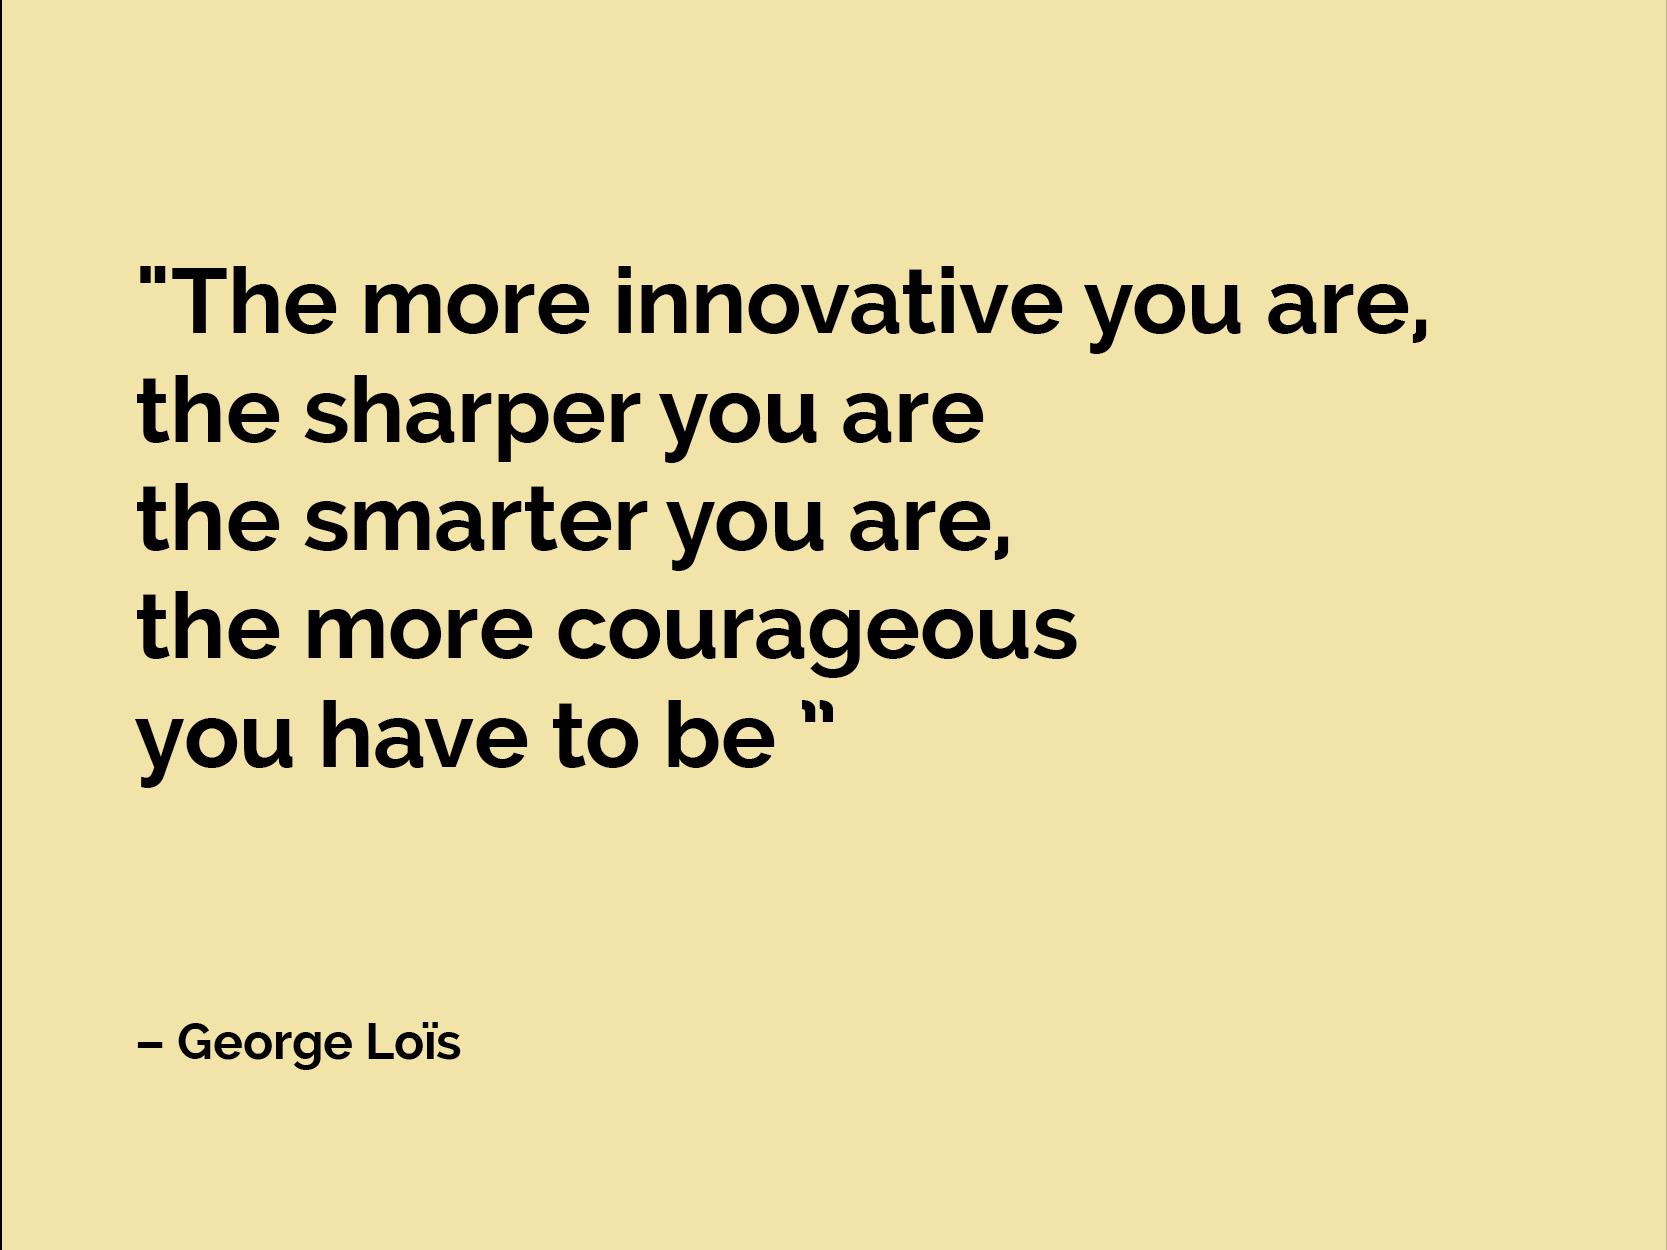 mantra George Lois2